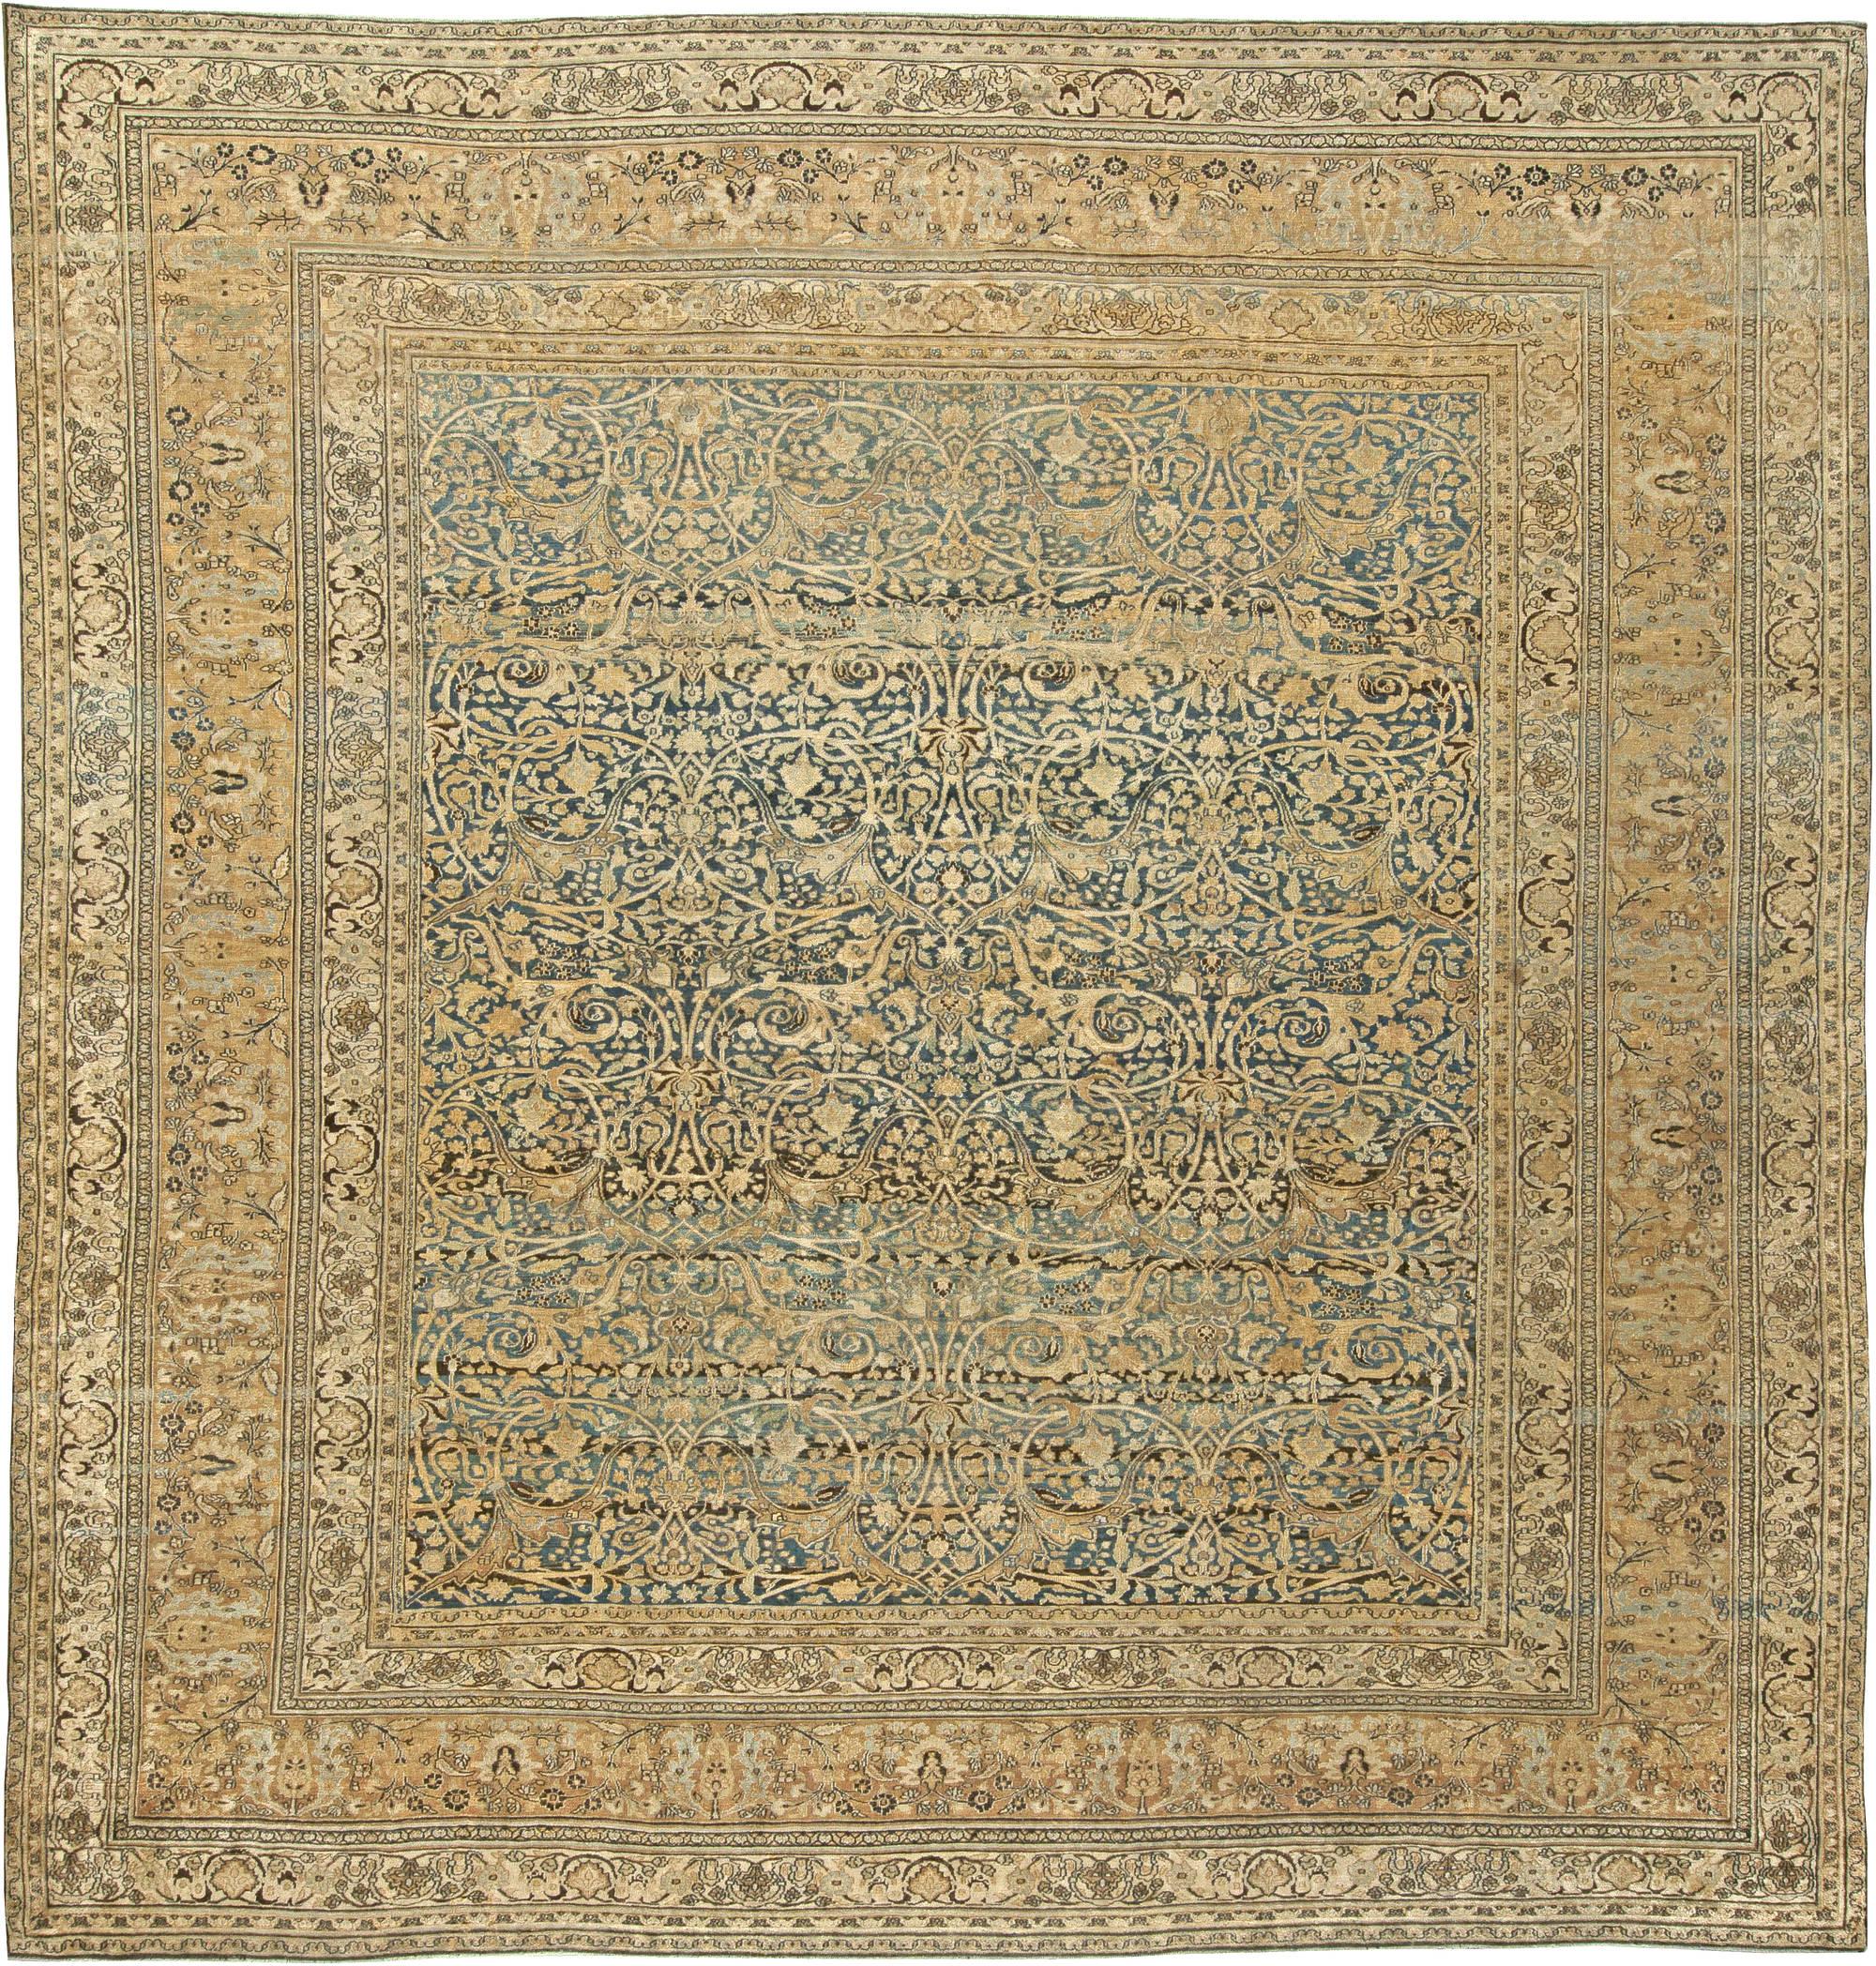 Antique Persian Khorassan Rug BB5793